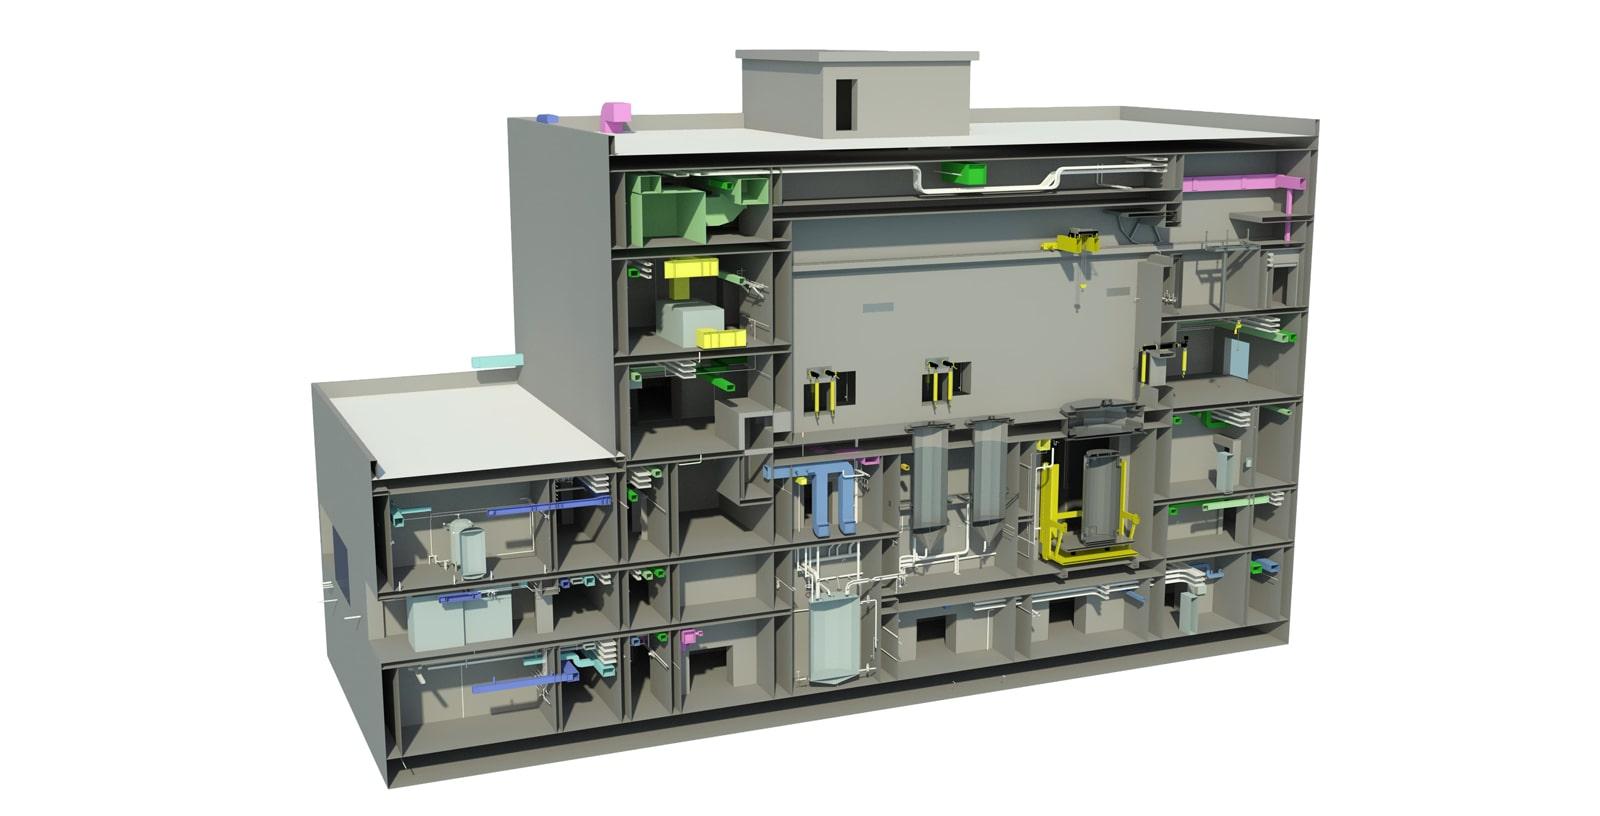 Idom_Nuclear_Services_ENRESA_Design_Engineering_Cask_Maintenance_Workshop_TMC_Central_Spent_Fuel_Storage_Facility_ATC_3D_building